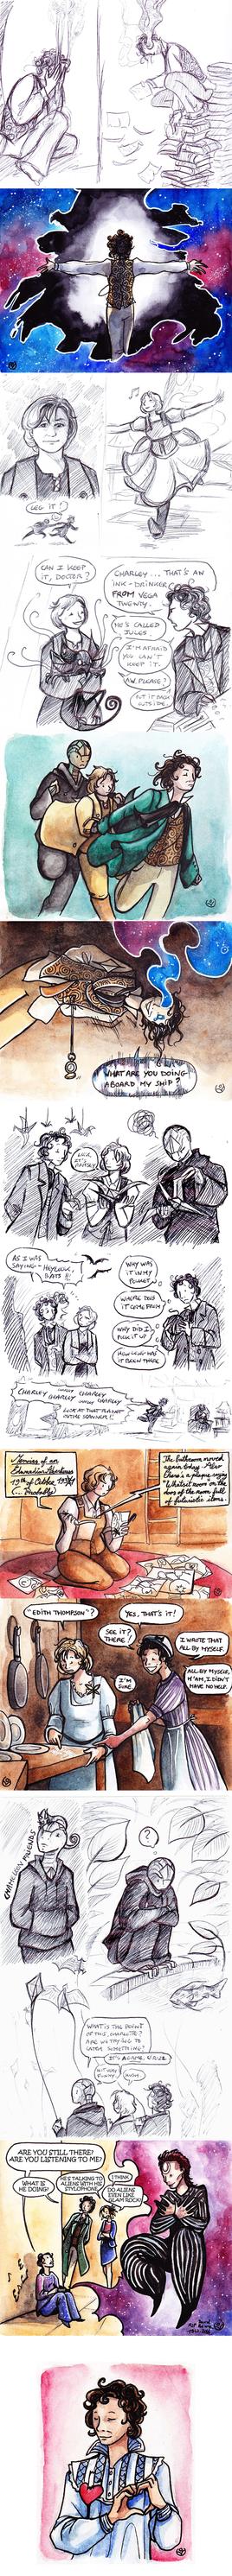 Big Finish Doctor Who sketchdump 7 by JohannesVIII